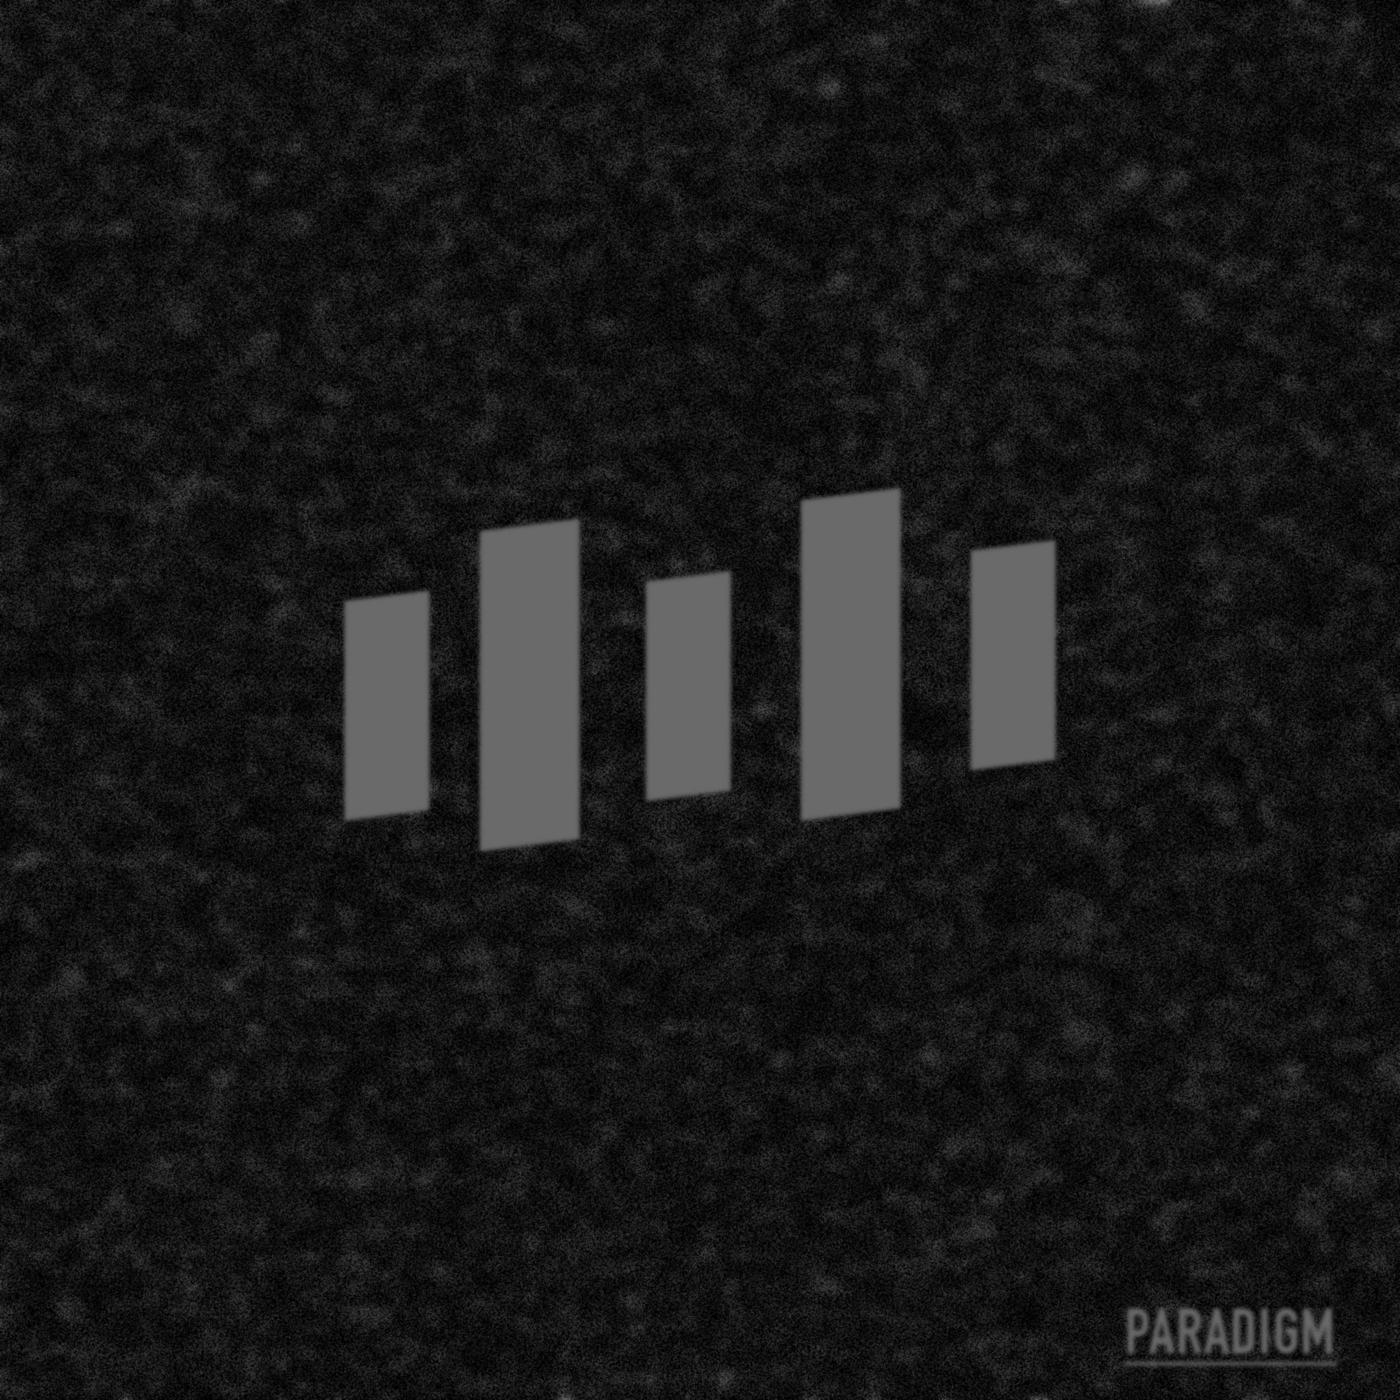 Parallels - US - Paradigm [single] (2018)